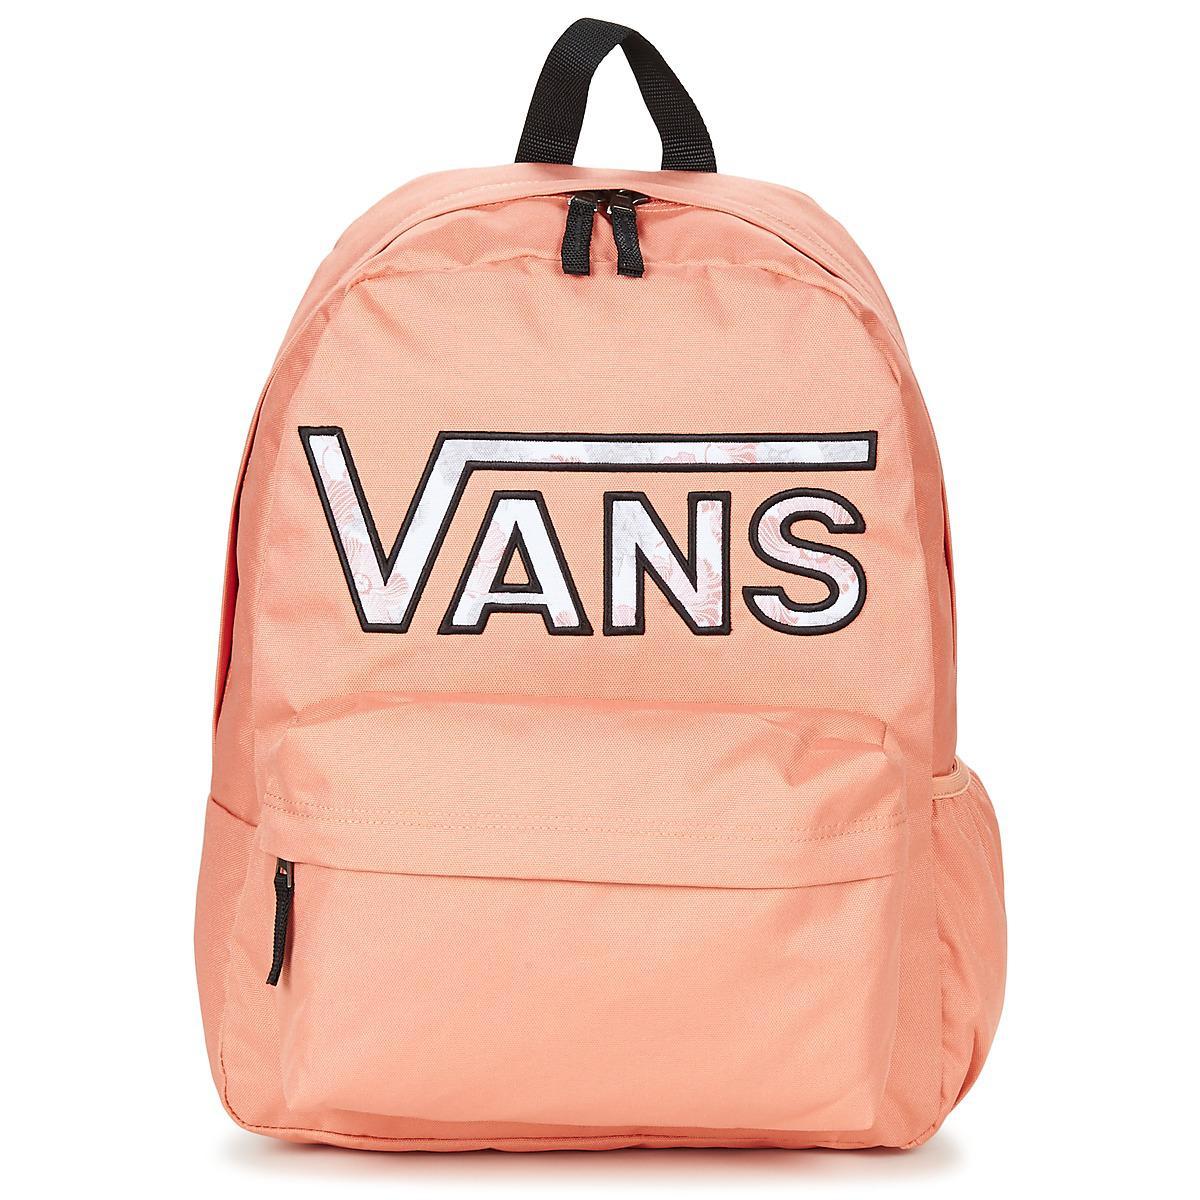 024886407ddc4 Vans Realm Flying V Backpack Women s Backpack In Pink in Pink - Lyst